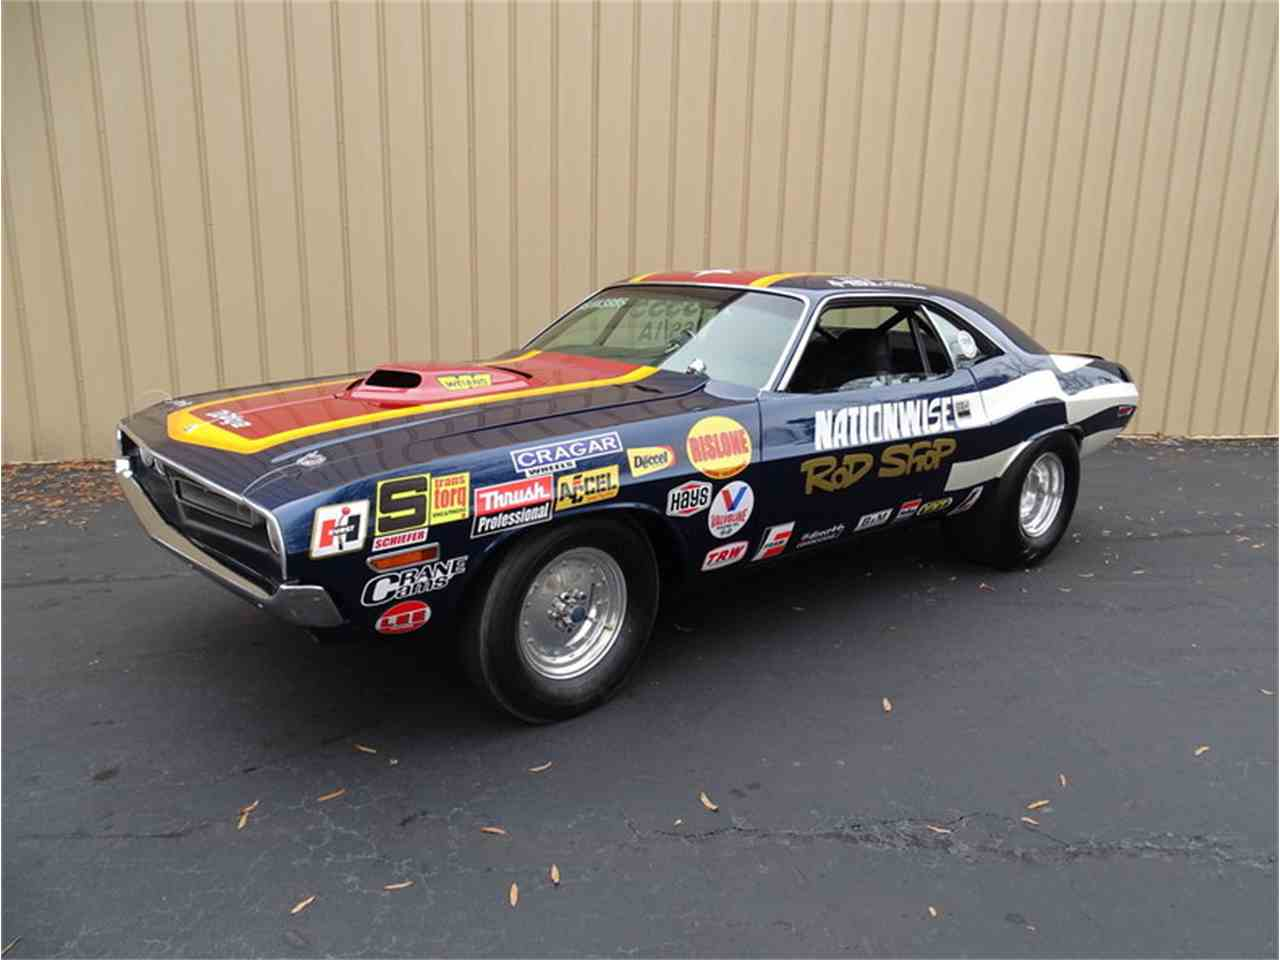 Famous Drag Car For Sale Gallery - Classic Cars Ideas - boiq.info